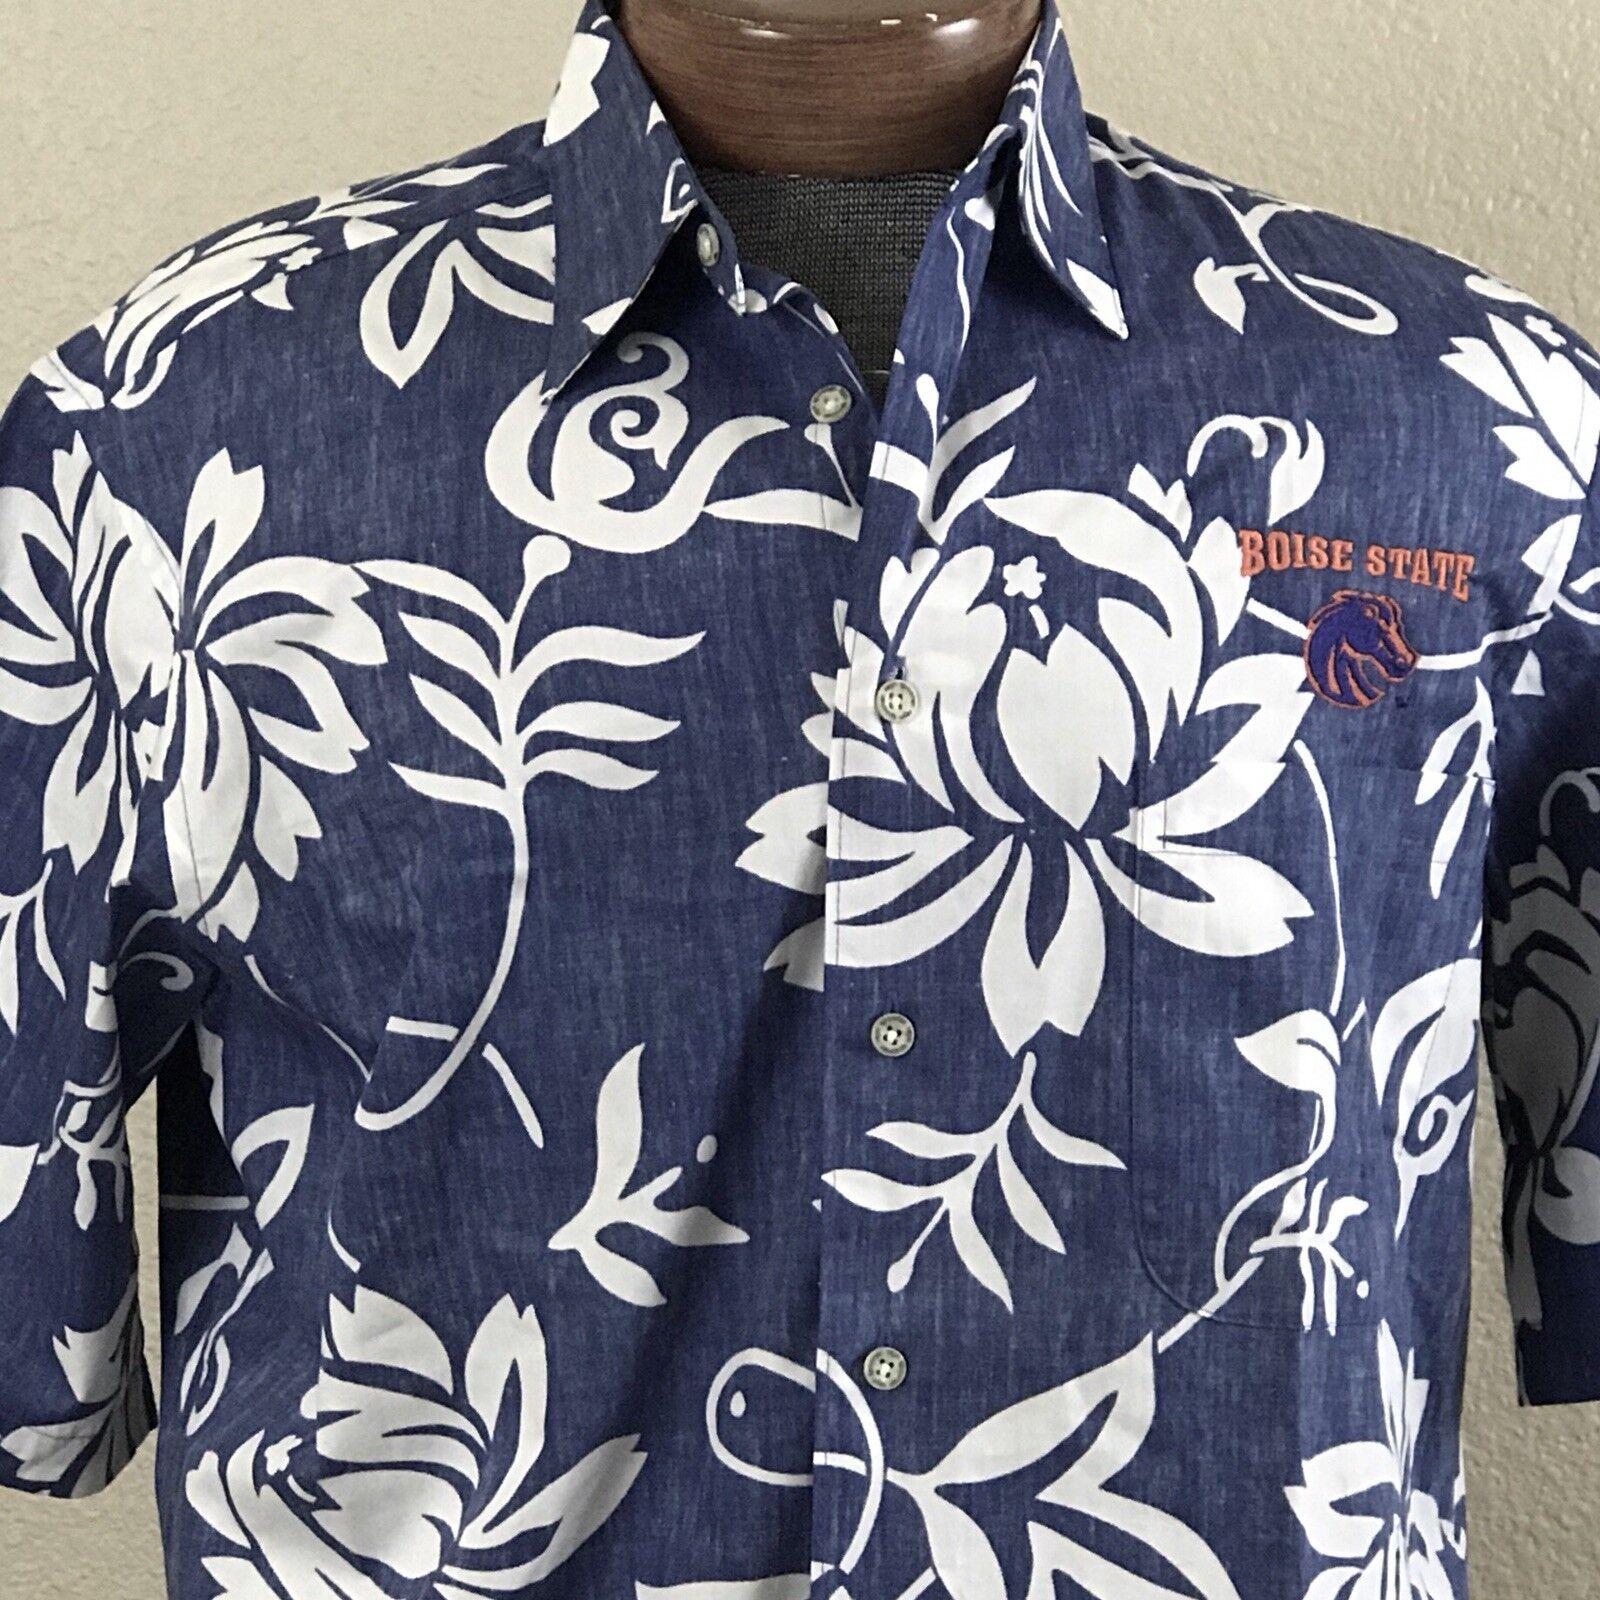 Reyn Spooner Shakeen Small Hawaiian Shirt Boise State Logo Broncos Reverse Idaho